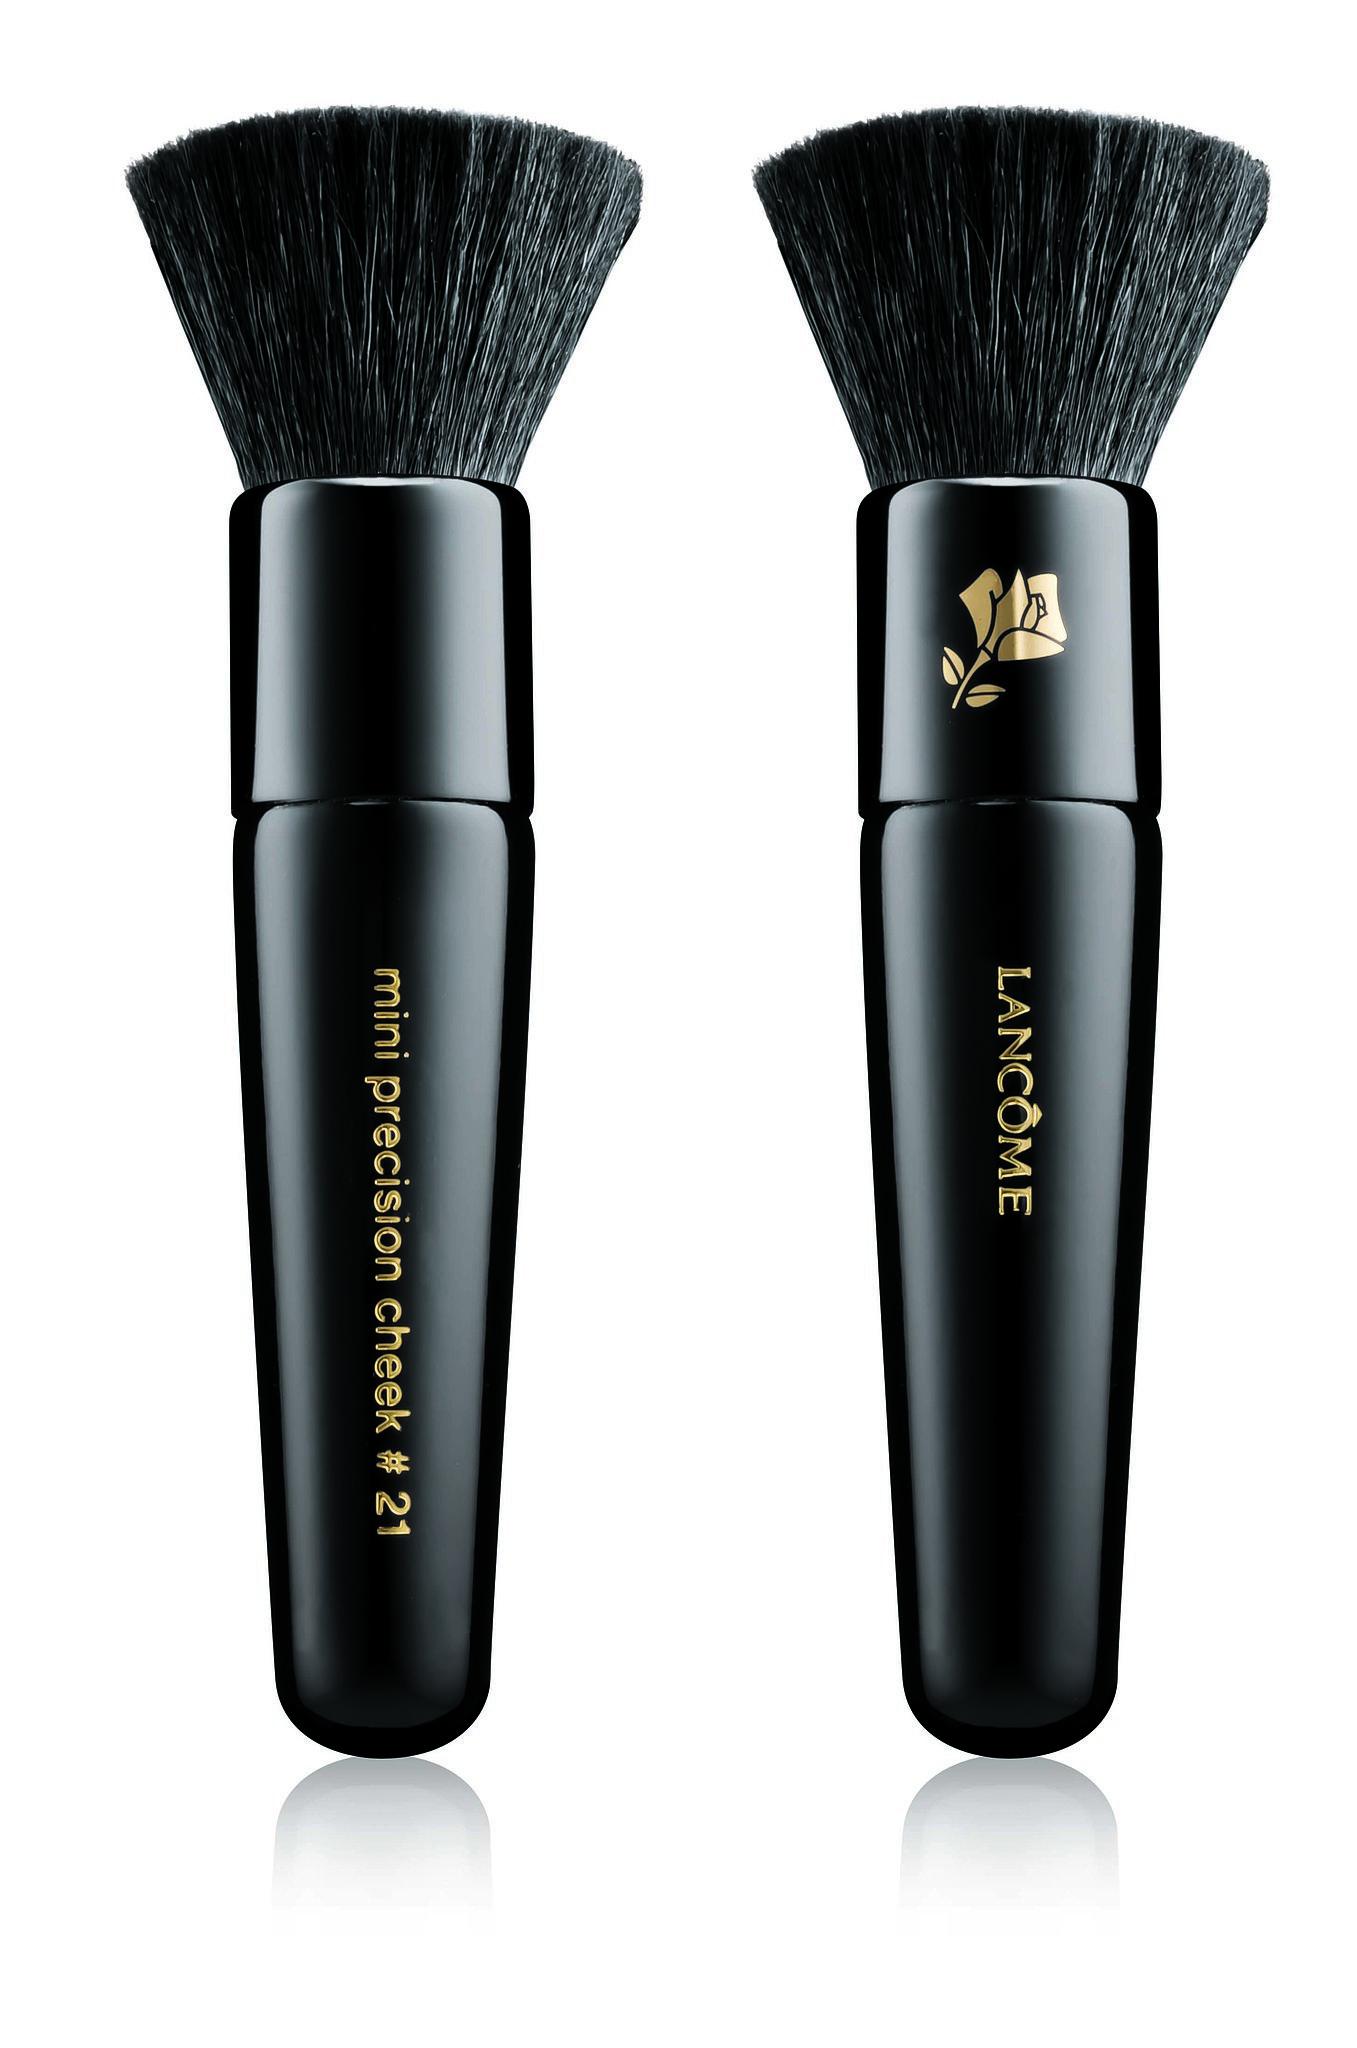 Lancome Jason Wu Petit Precision Cheek Brush